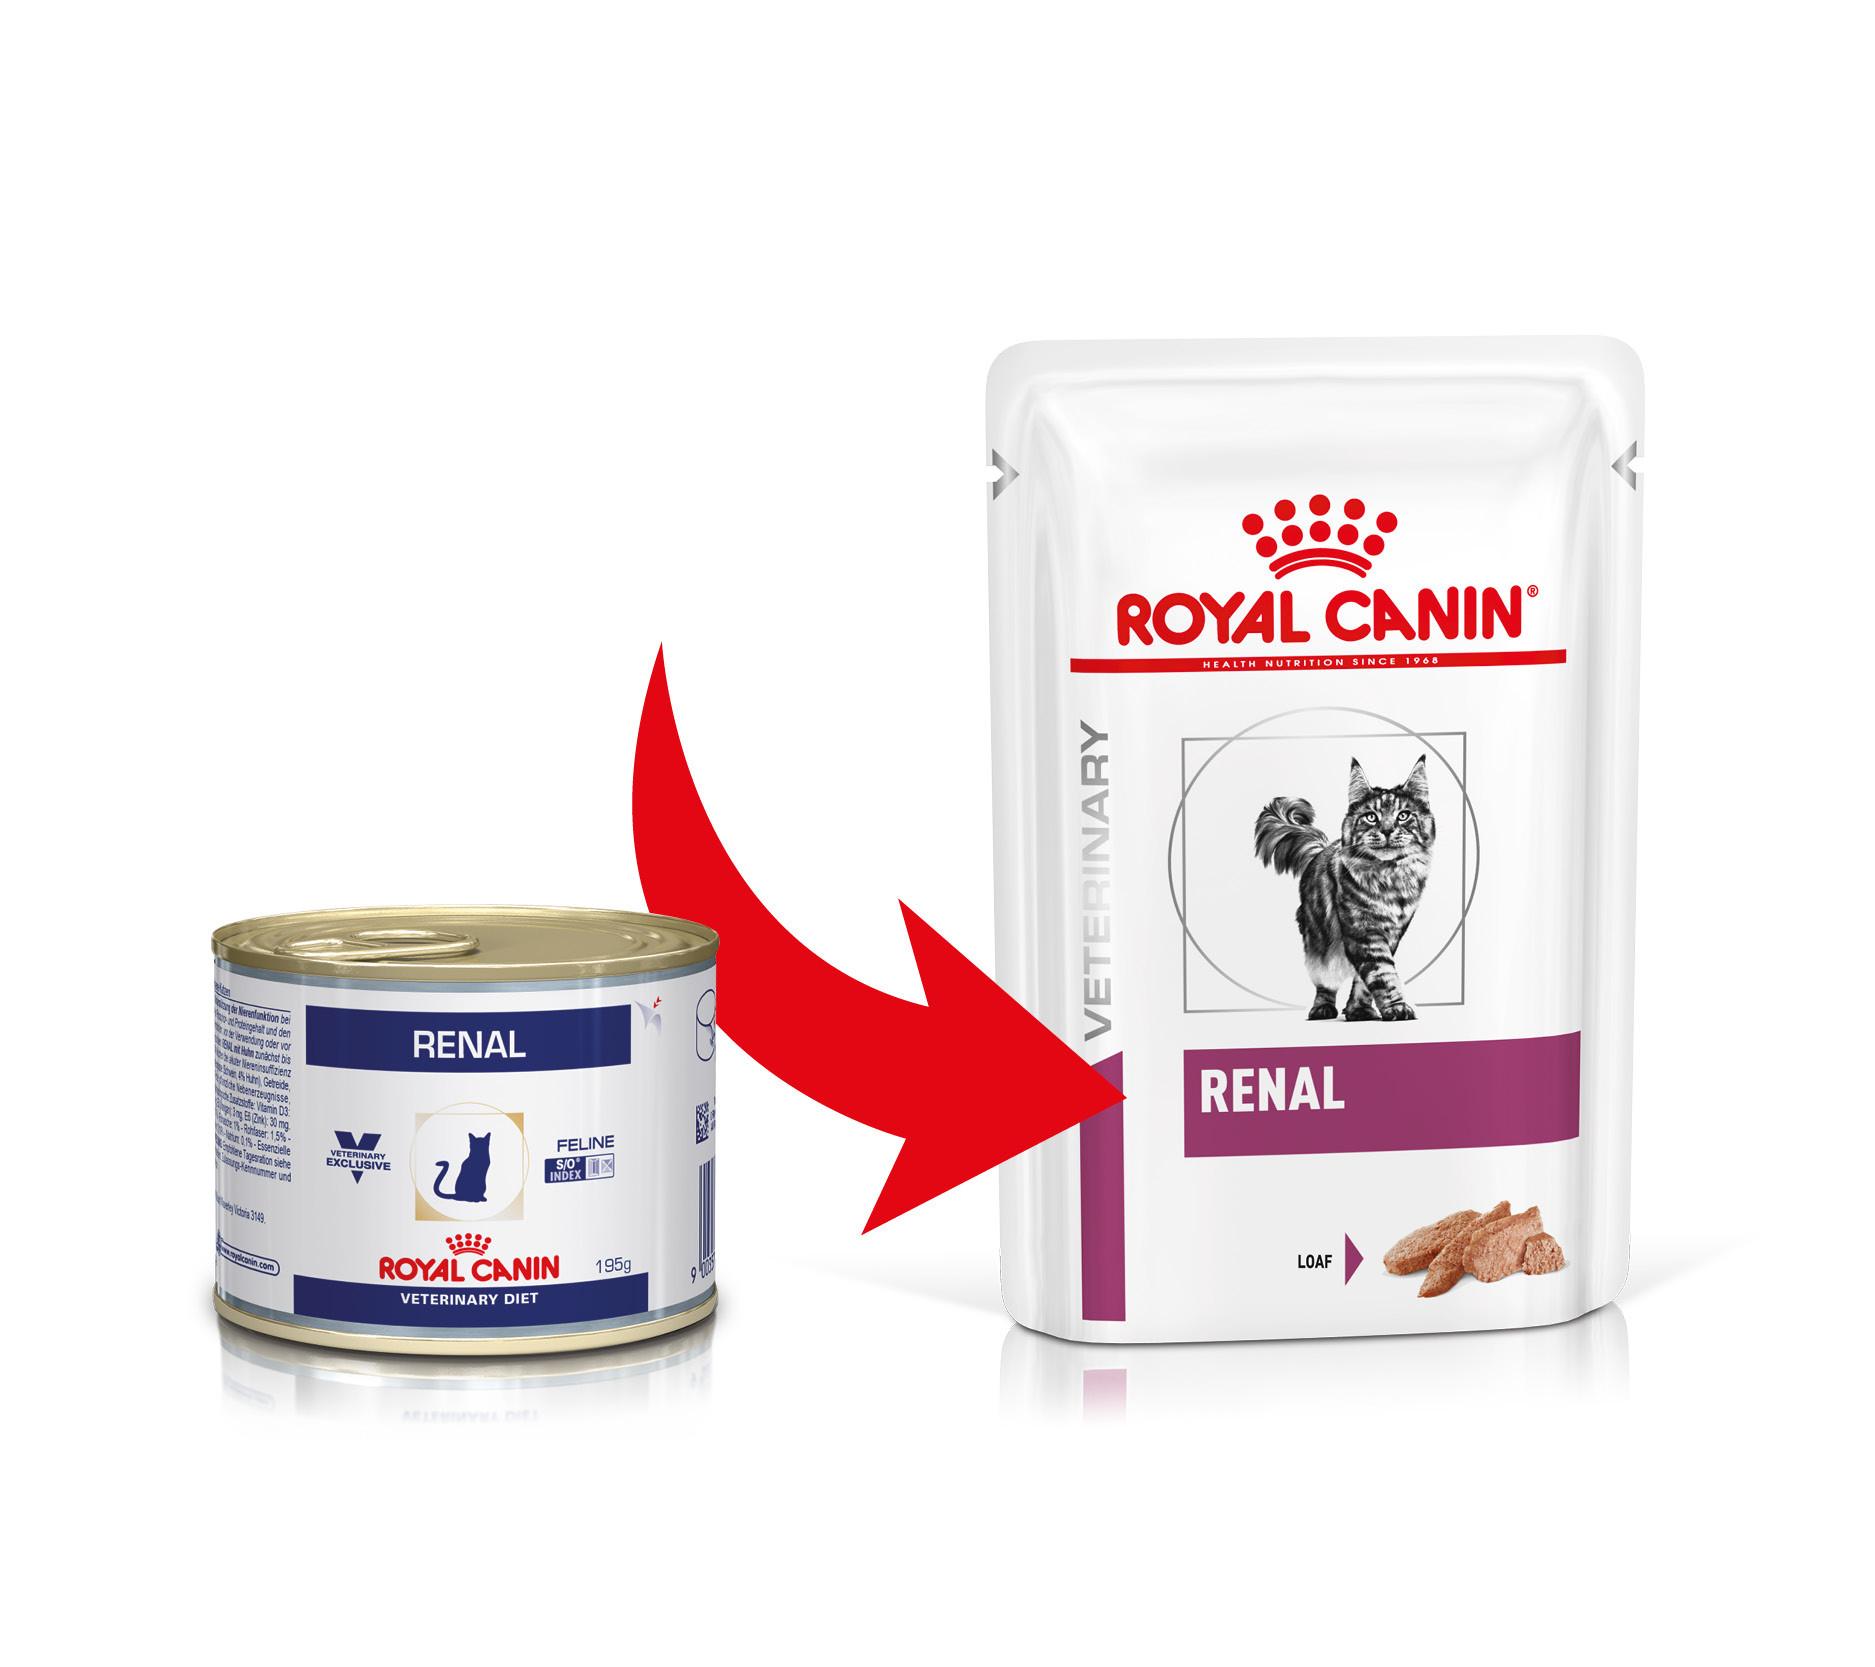 Royal Canin Veterinary Diet Renal 195g (in Dosen) Katzenfutter AUSVERKAUF